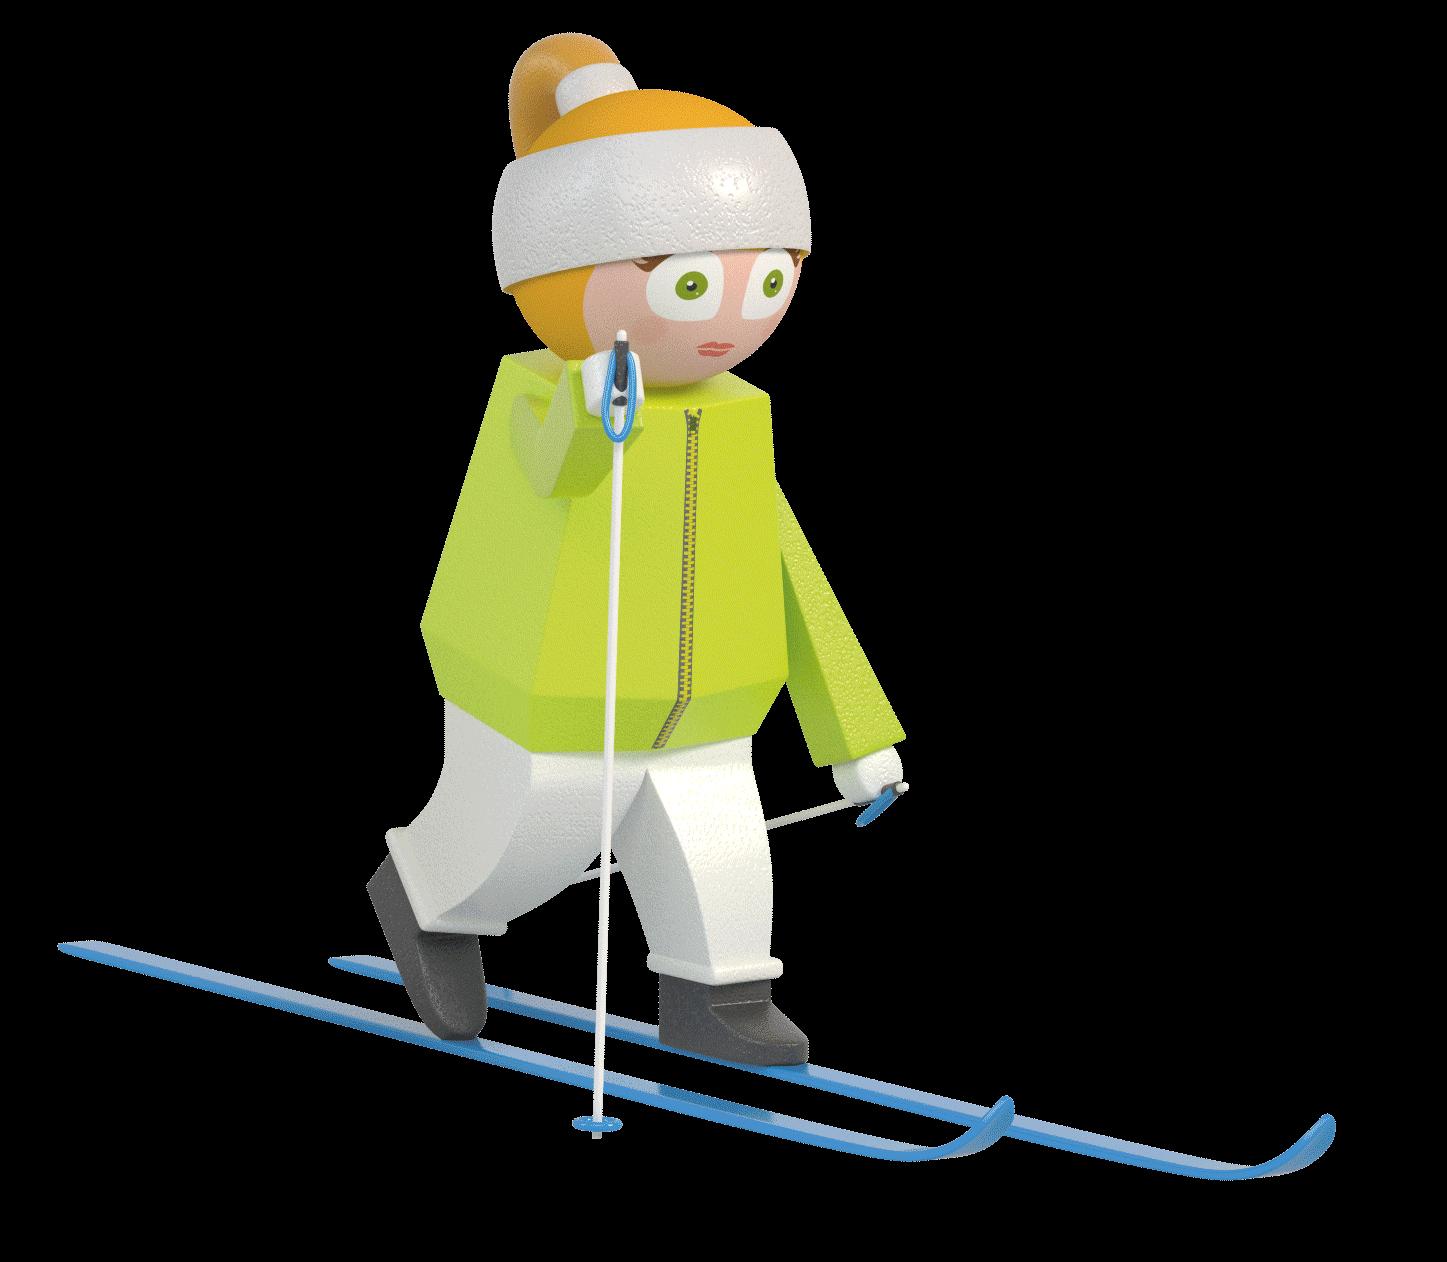 SkieurFond